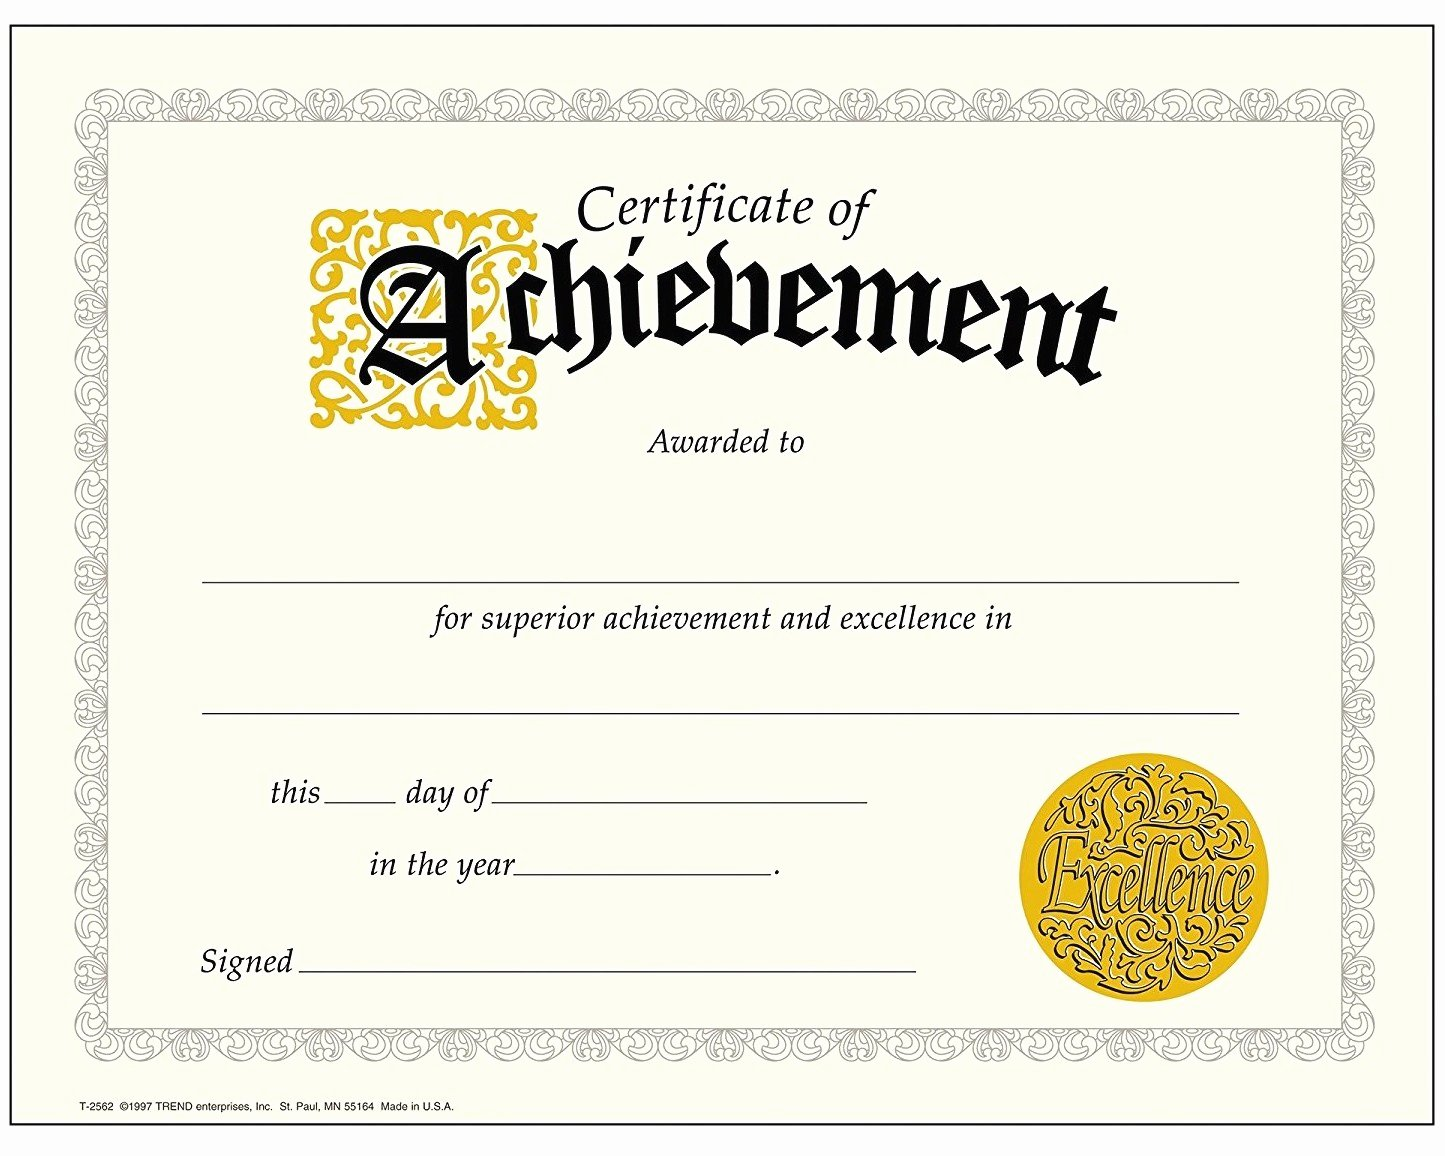 Trend Enterprises Certificate Template Best Of Achievement Certificate Best Of Trend Enterprises Classic